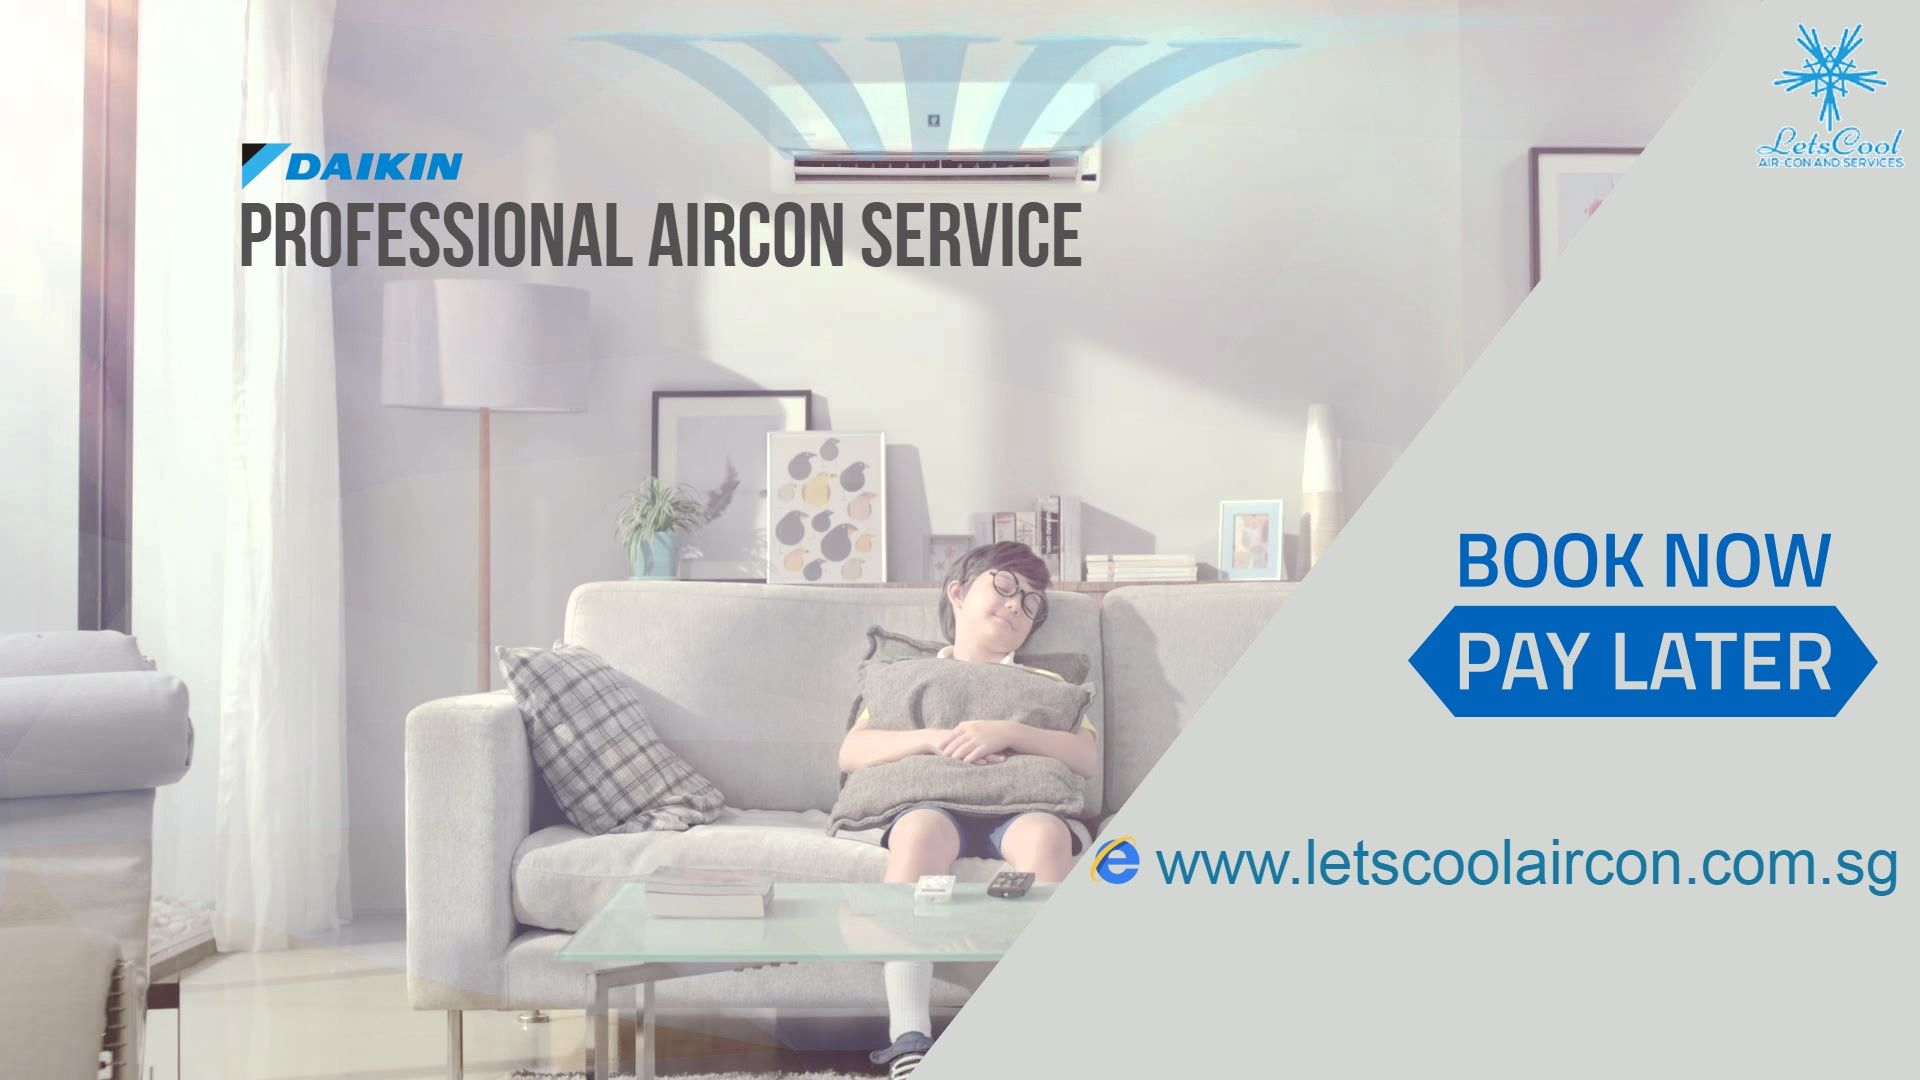 Daikin Aircon service in Singapore. Letscool Aircon , We